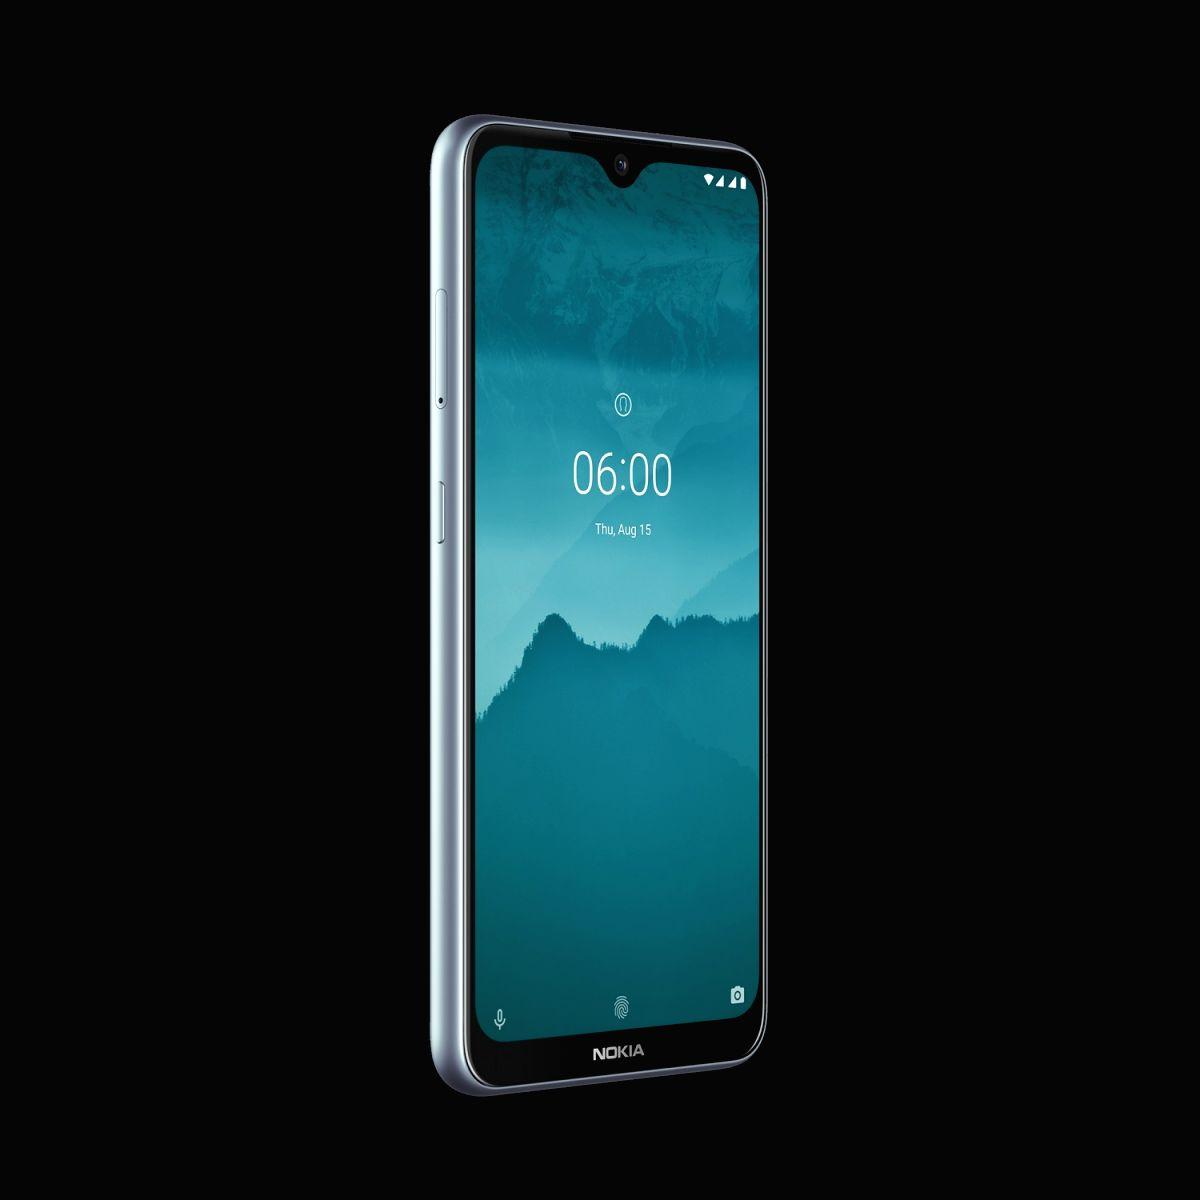 Nokia smartphone.